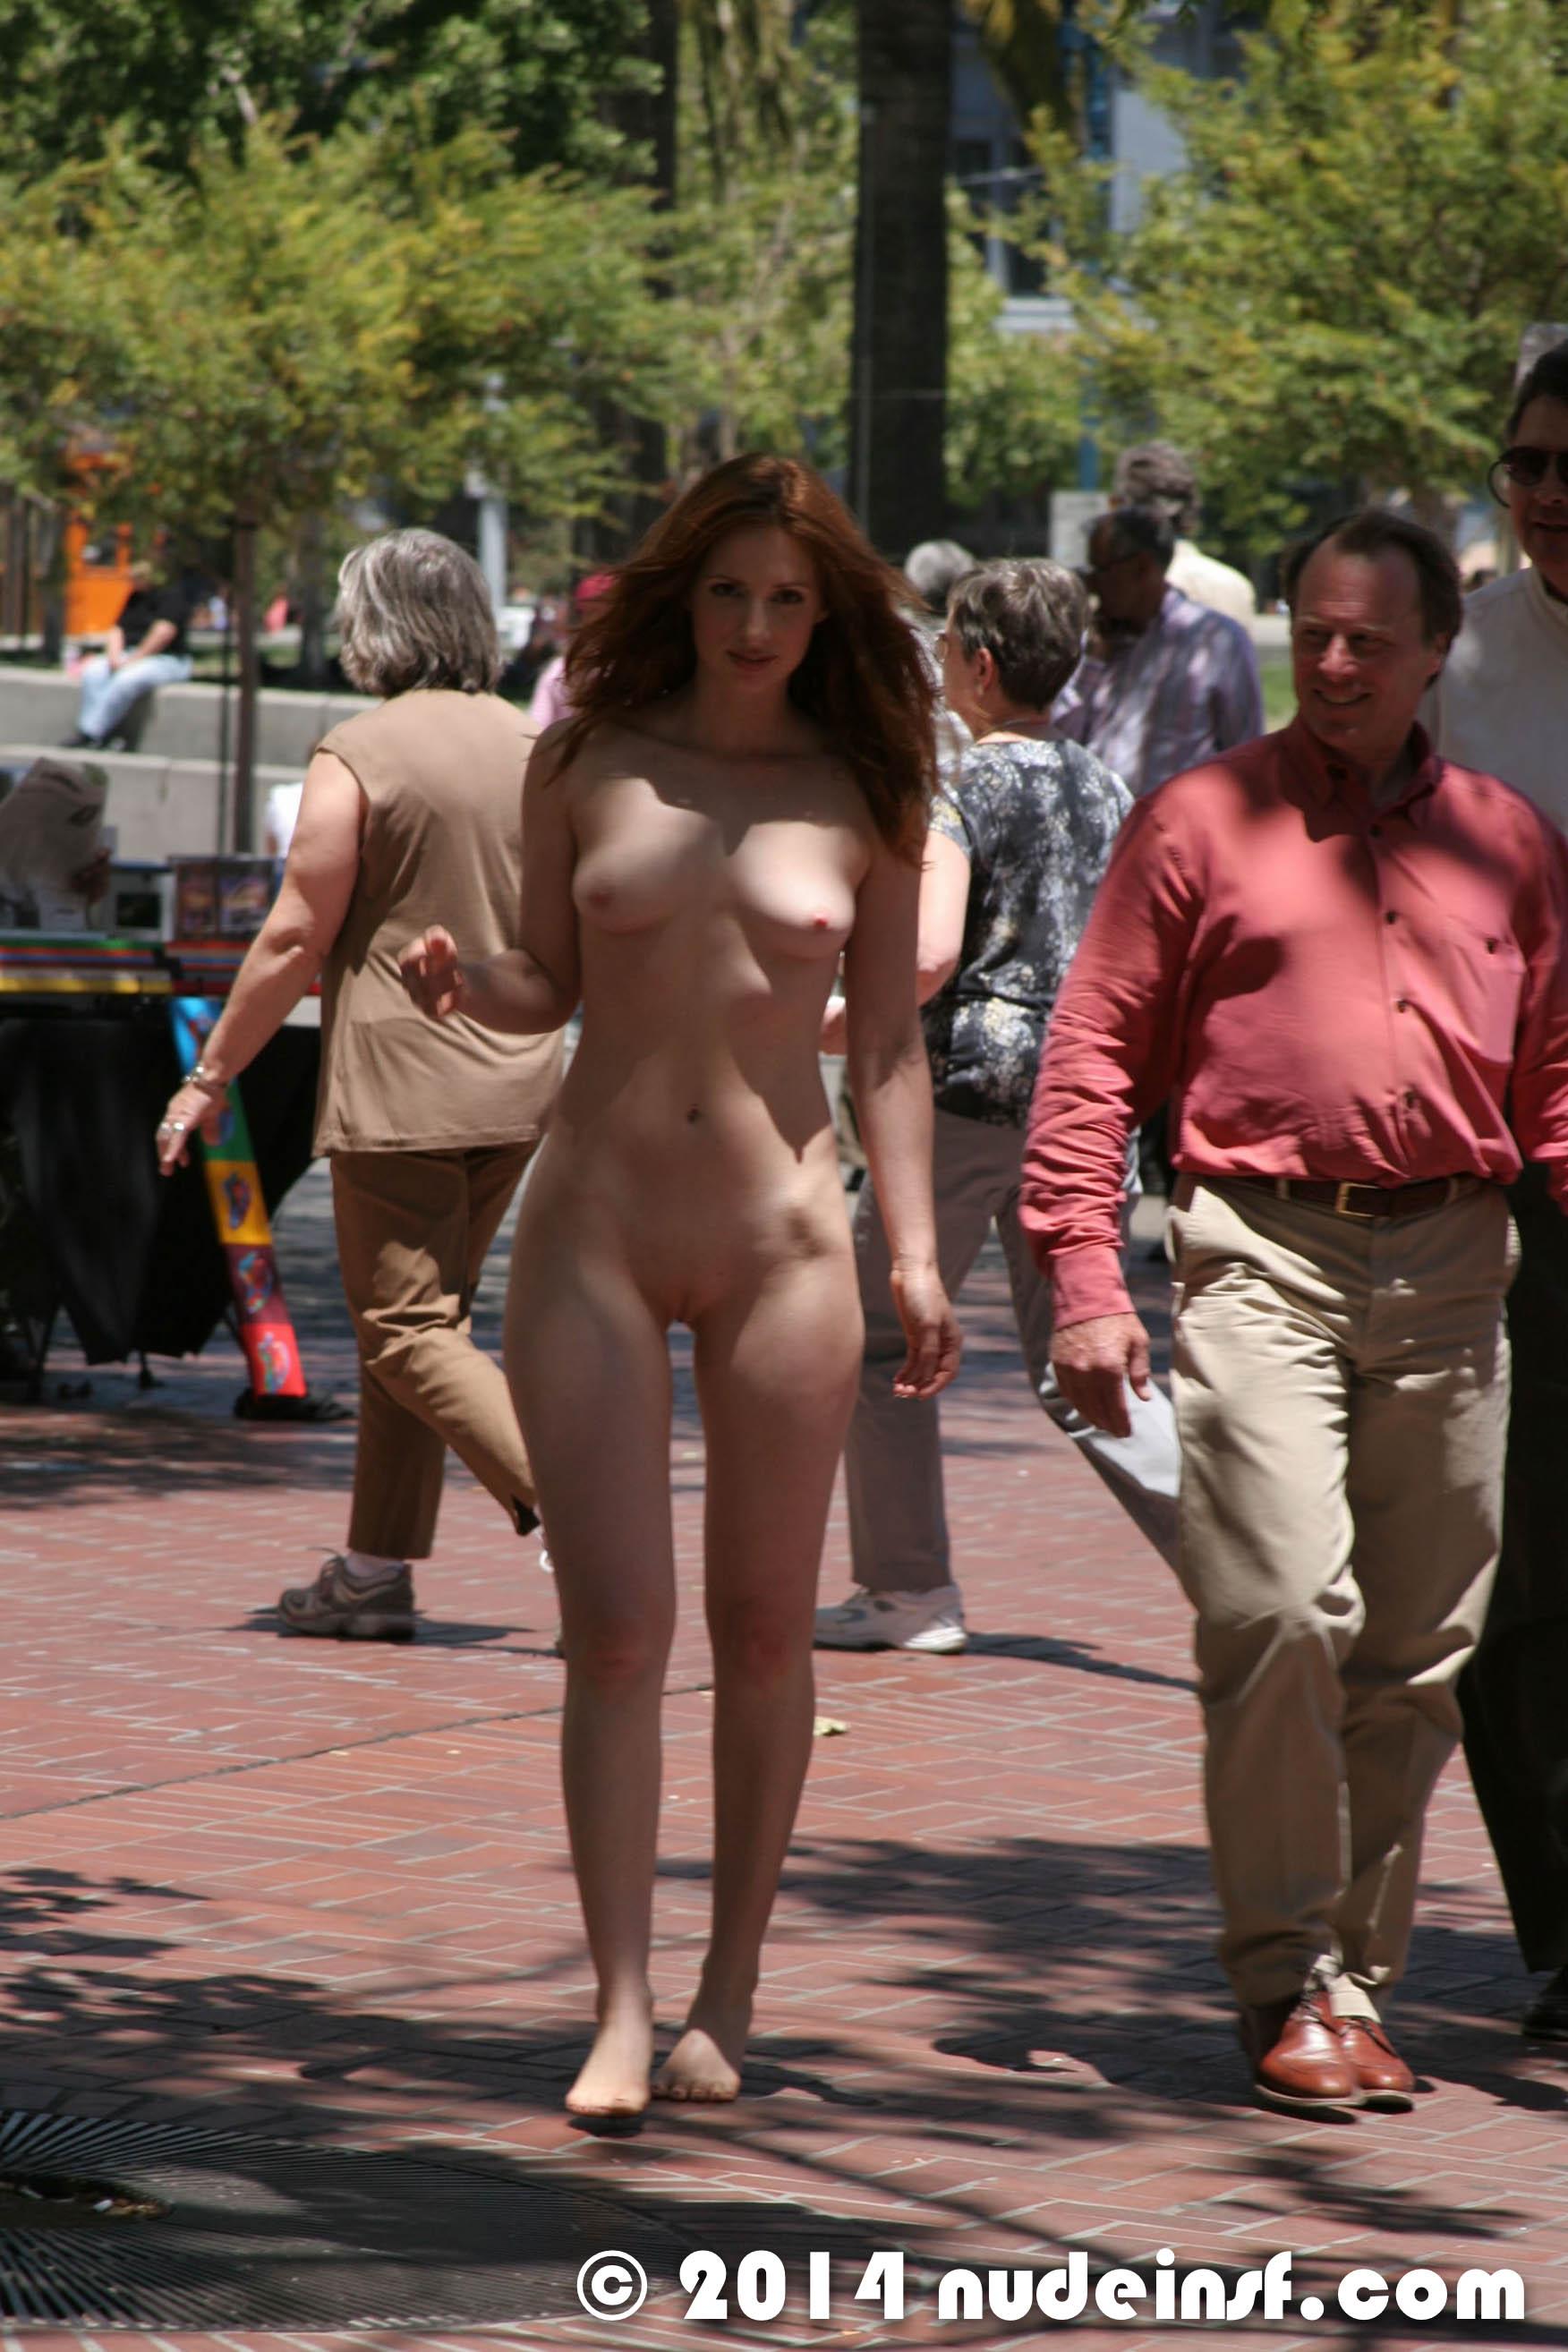 Not Girls public nudity flashing